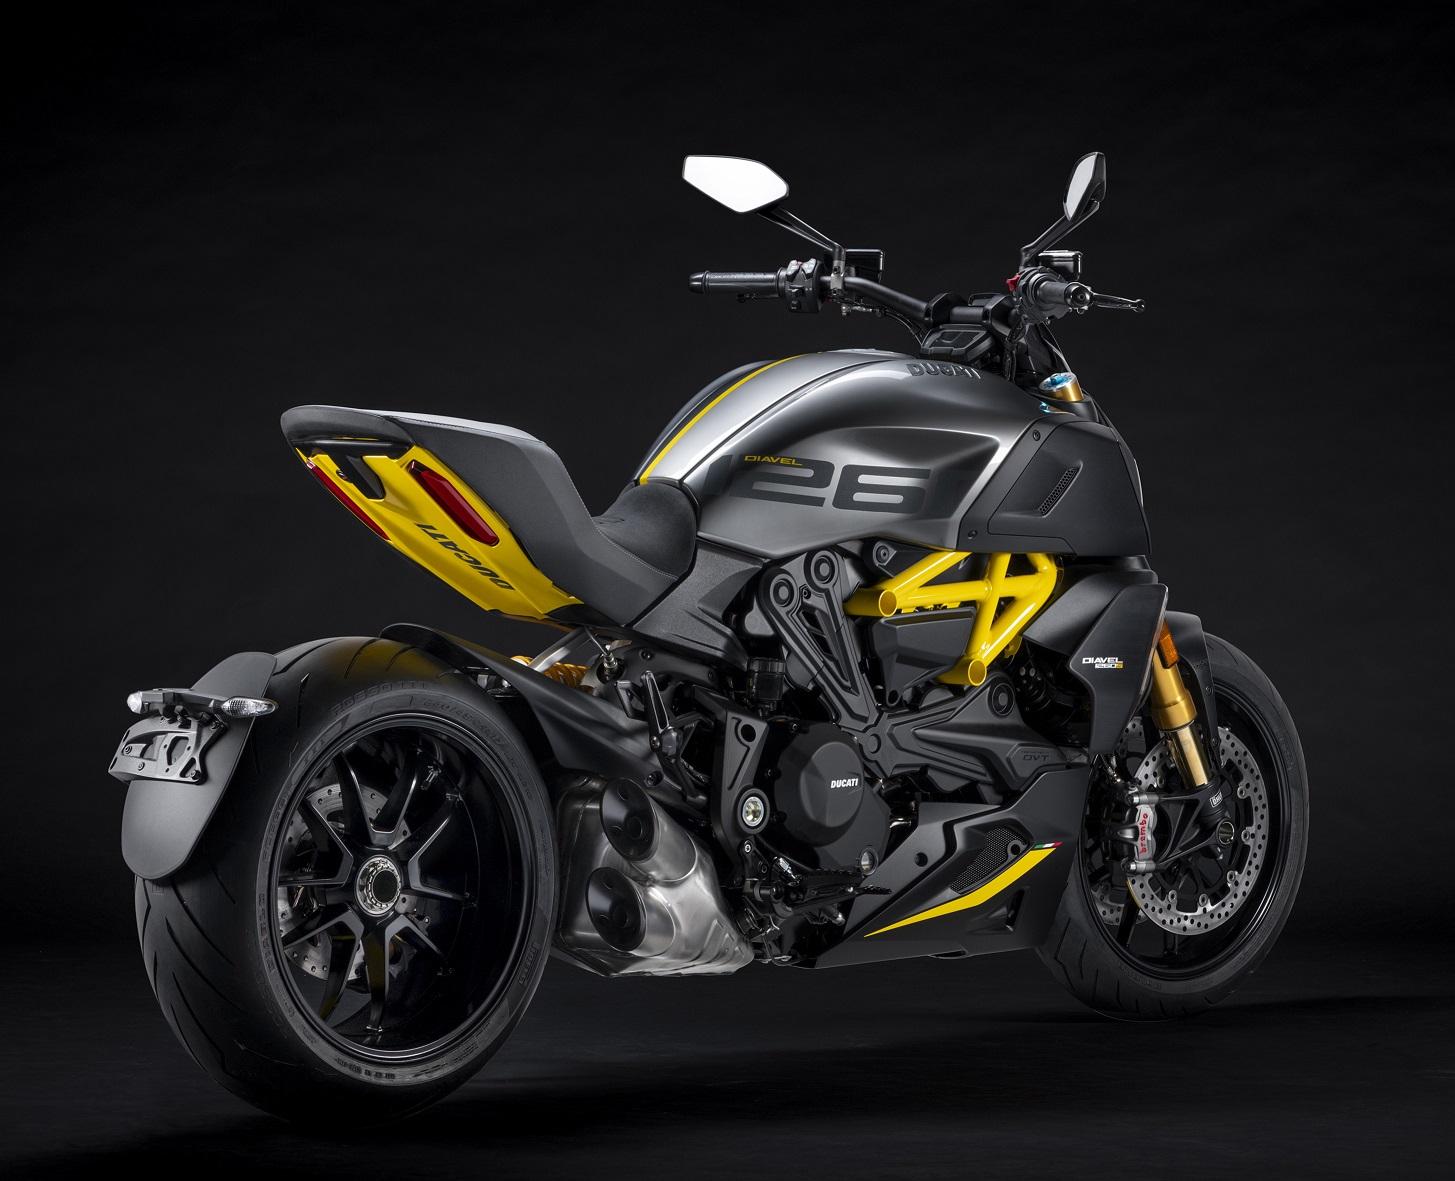 Ducati Diavel Black And Steel 3